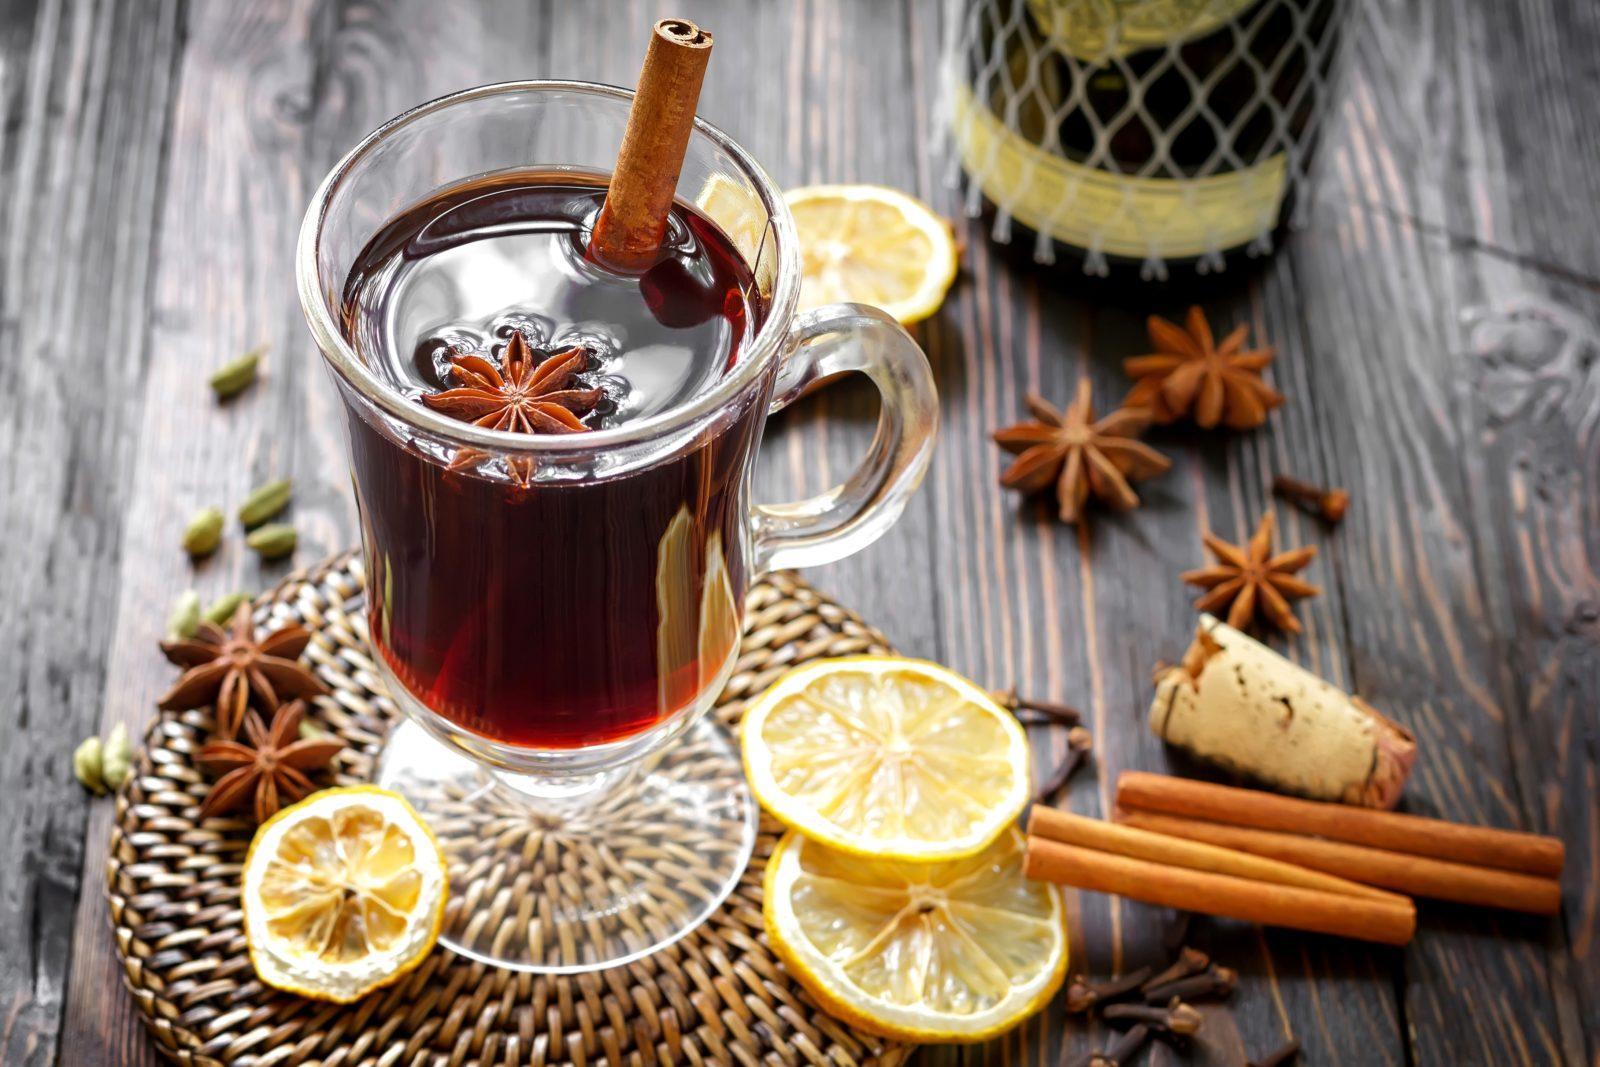 http://korysno.pro/wp-content/uploads/2015/11/glintveyn-napitok-vino-limon.jpg